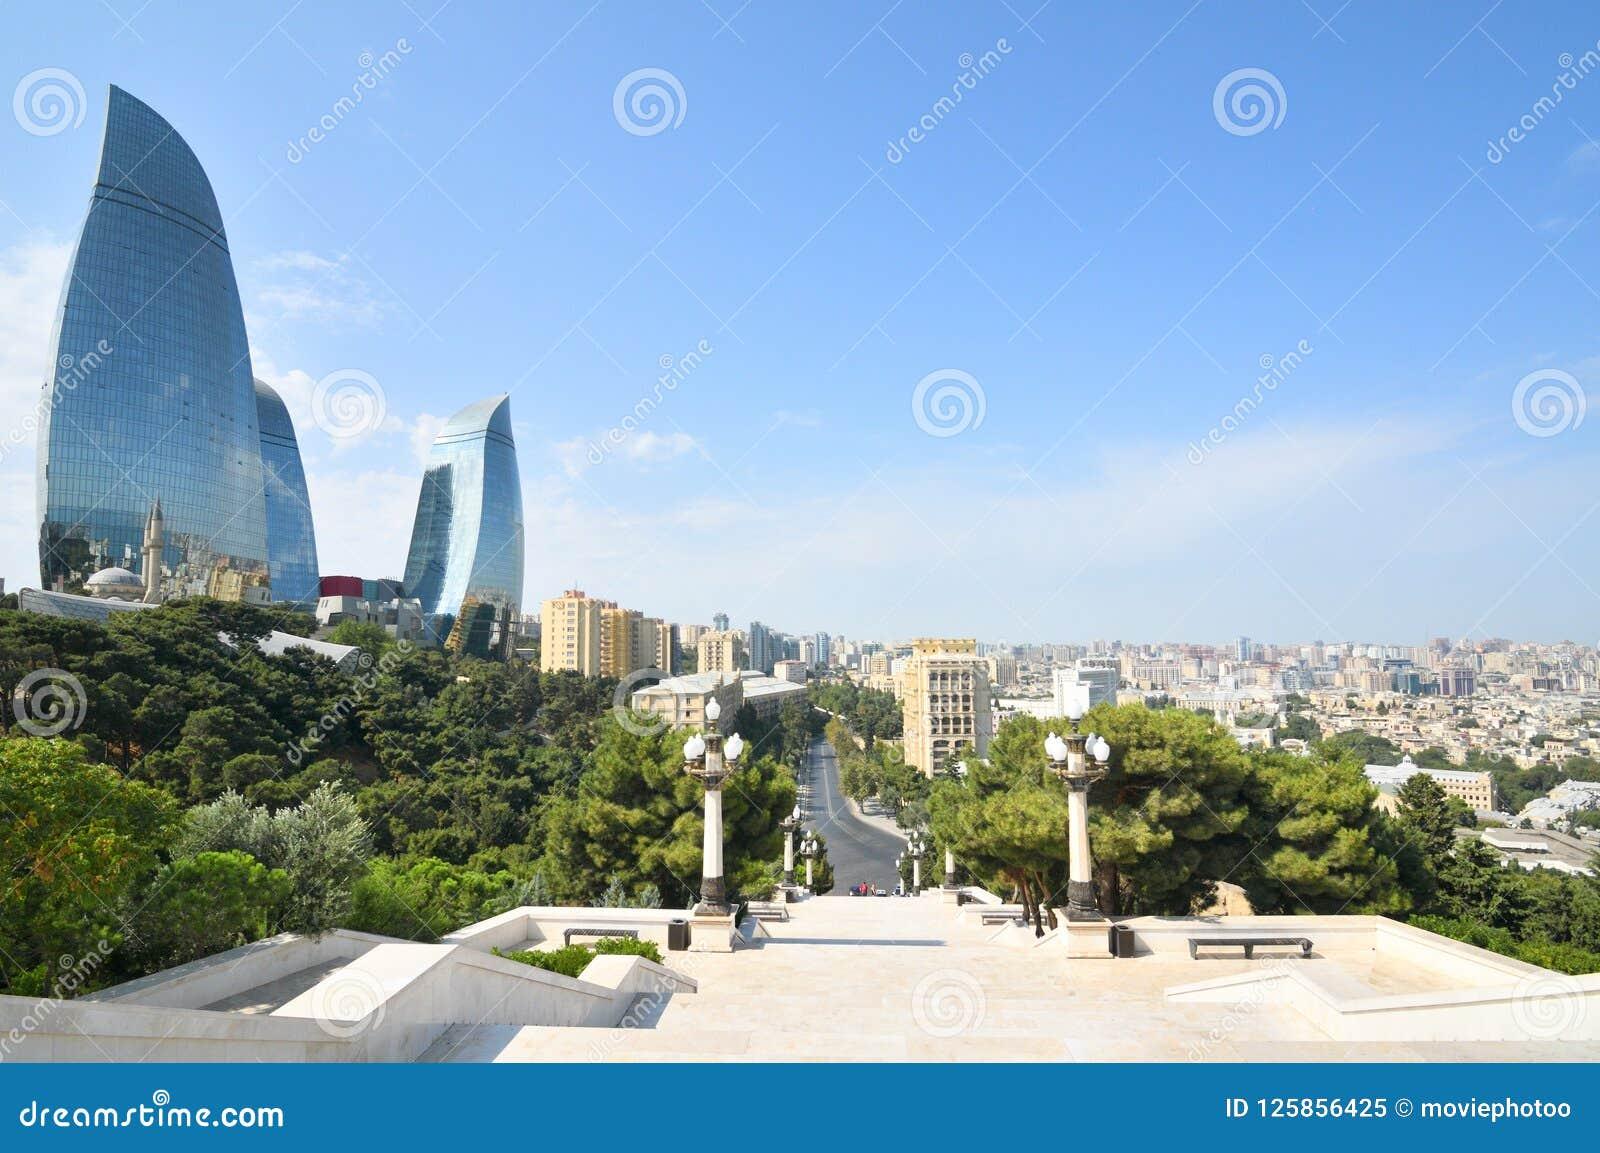 Баку, панорамный взгляд от парка горы